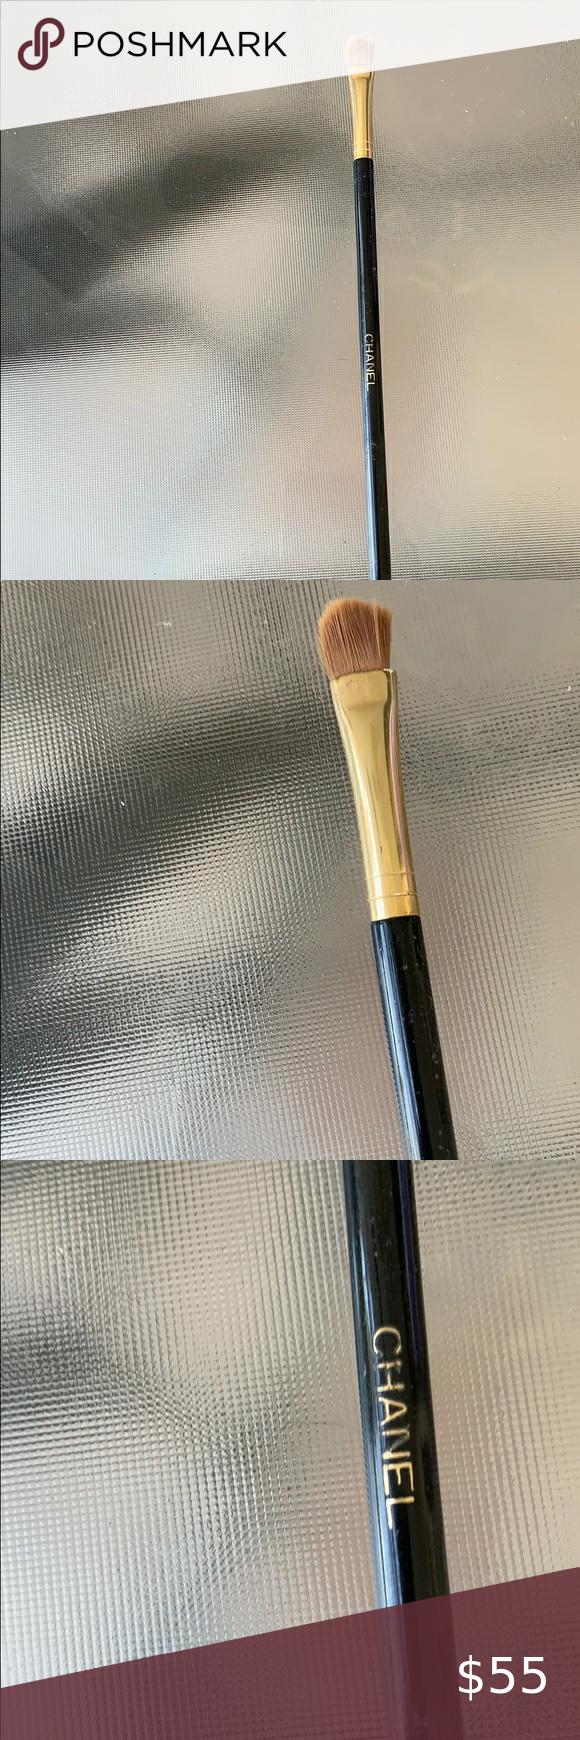 CHANEL BN eyeshadow brush in 2020 Eyeshadow brushes